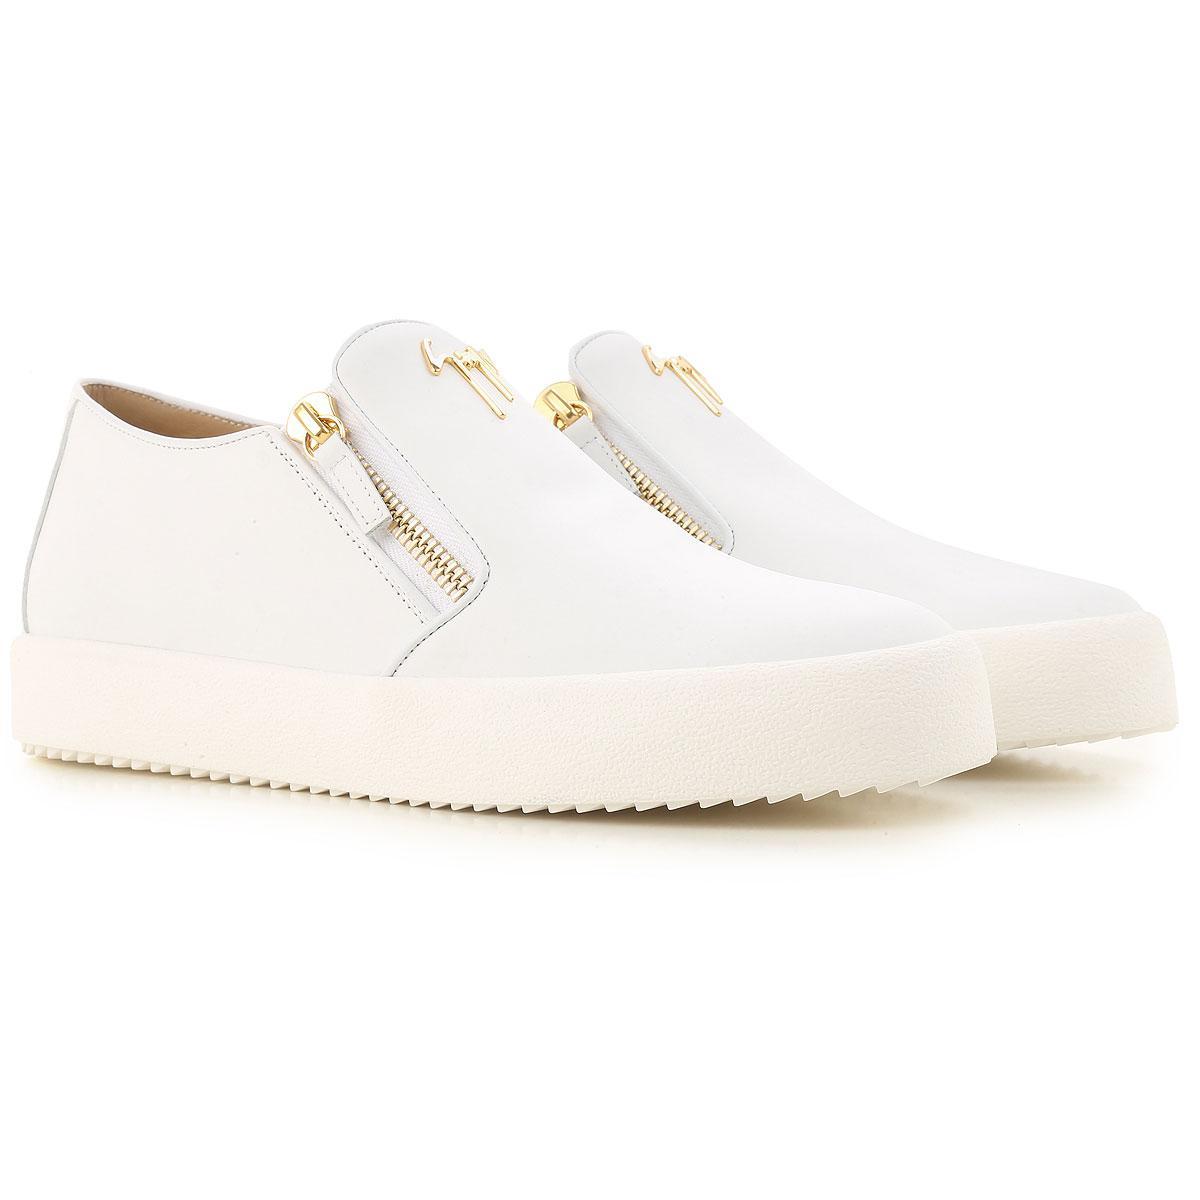 4e2a10a3a6f3b Giuseppe Zanotti Shoes For Men in White for Men - Lyst